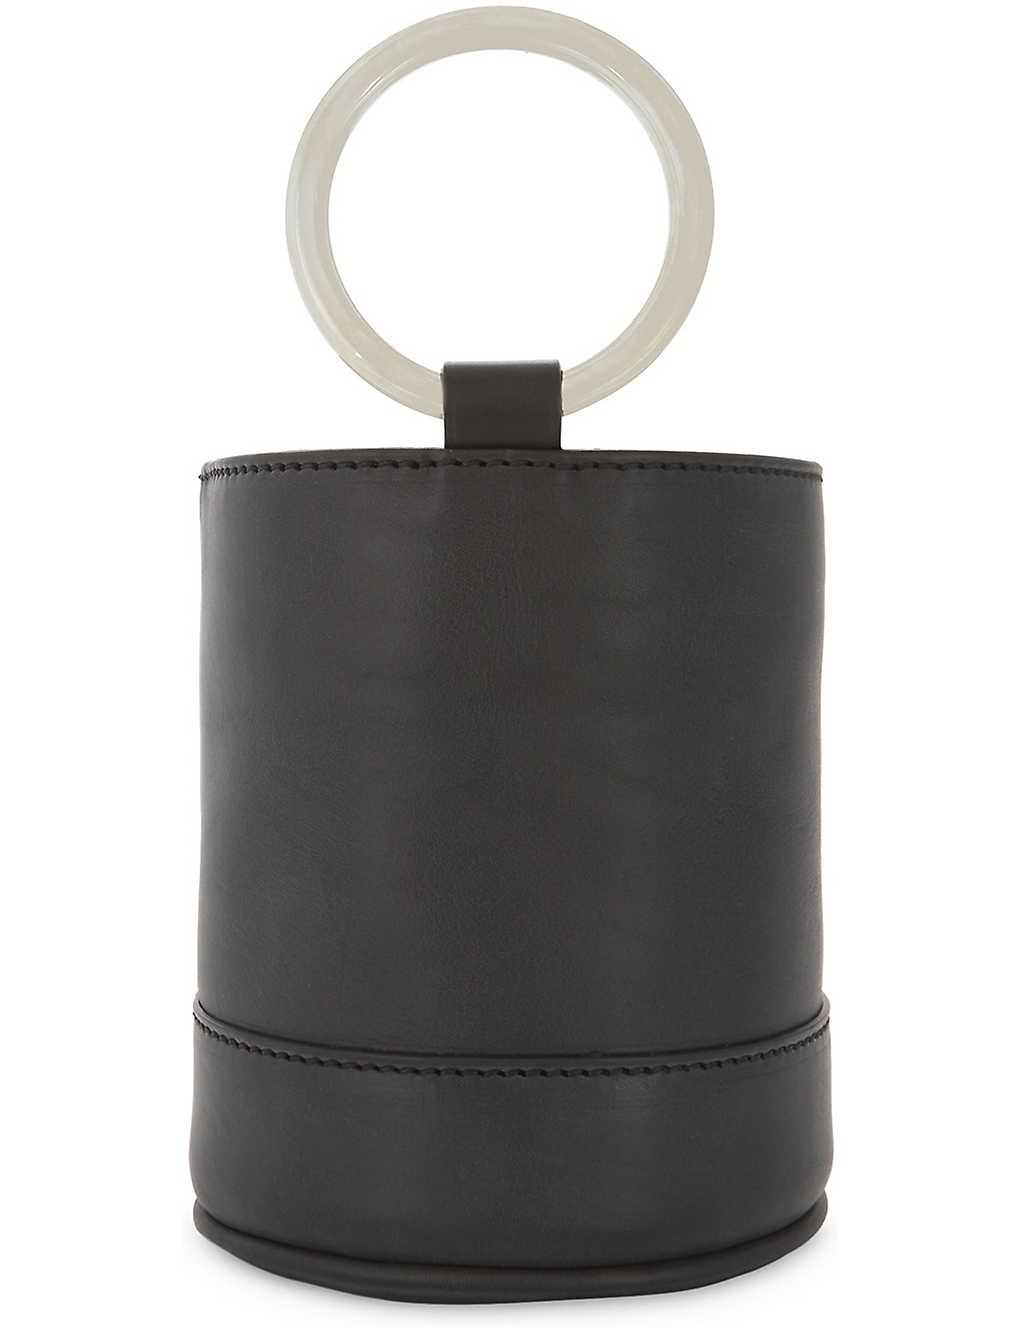 8c0b75b5945 SIMON MILLER - Bonsai 15 mini suede bucket bag | Selfridges.com